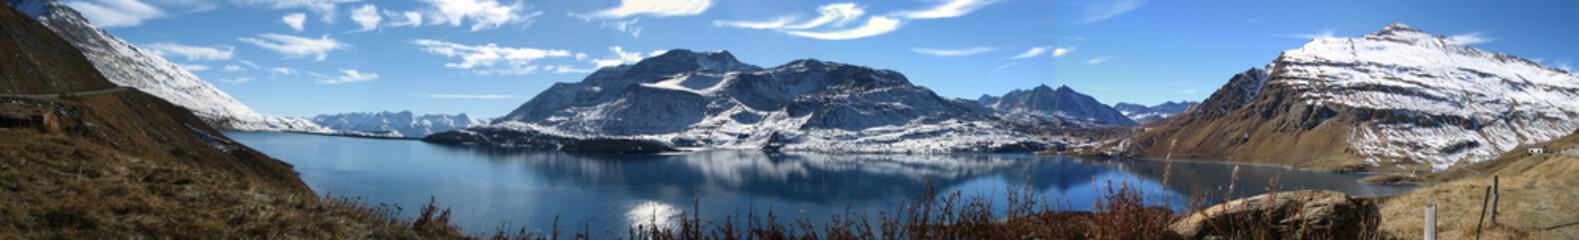 Panoramique Montagne Mont Cenis neige